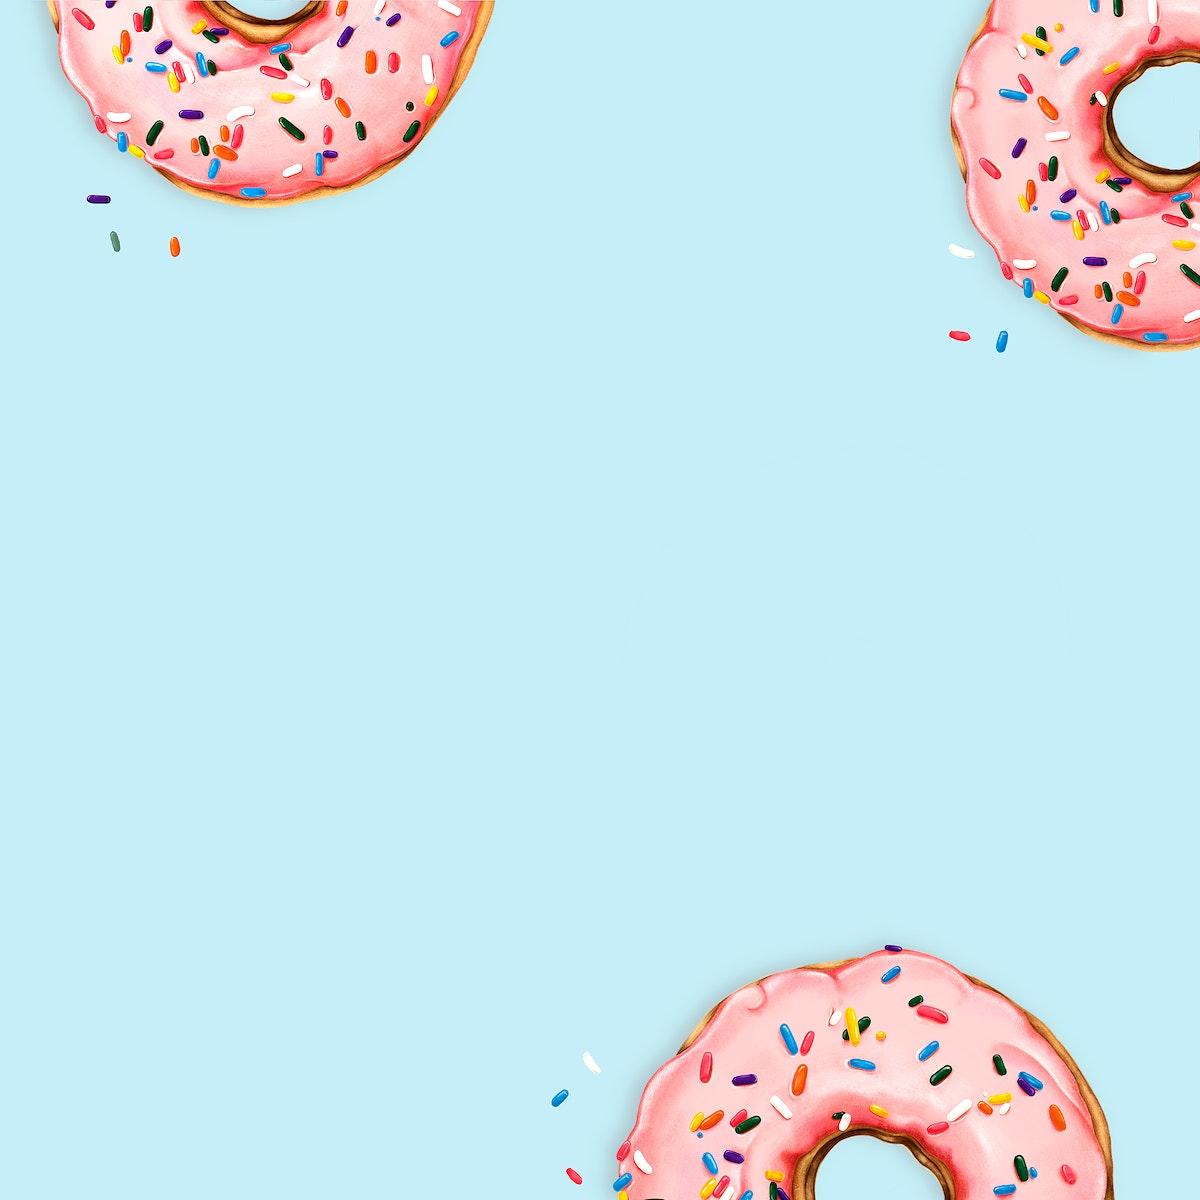 Donut Patterned Frame Template Free Psd High Resolution Mockup